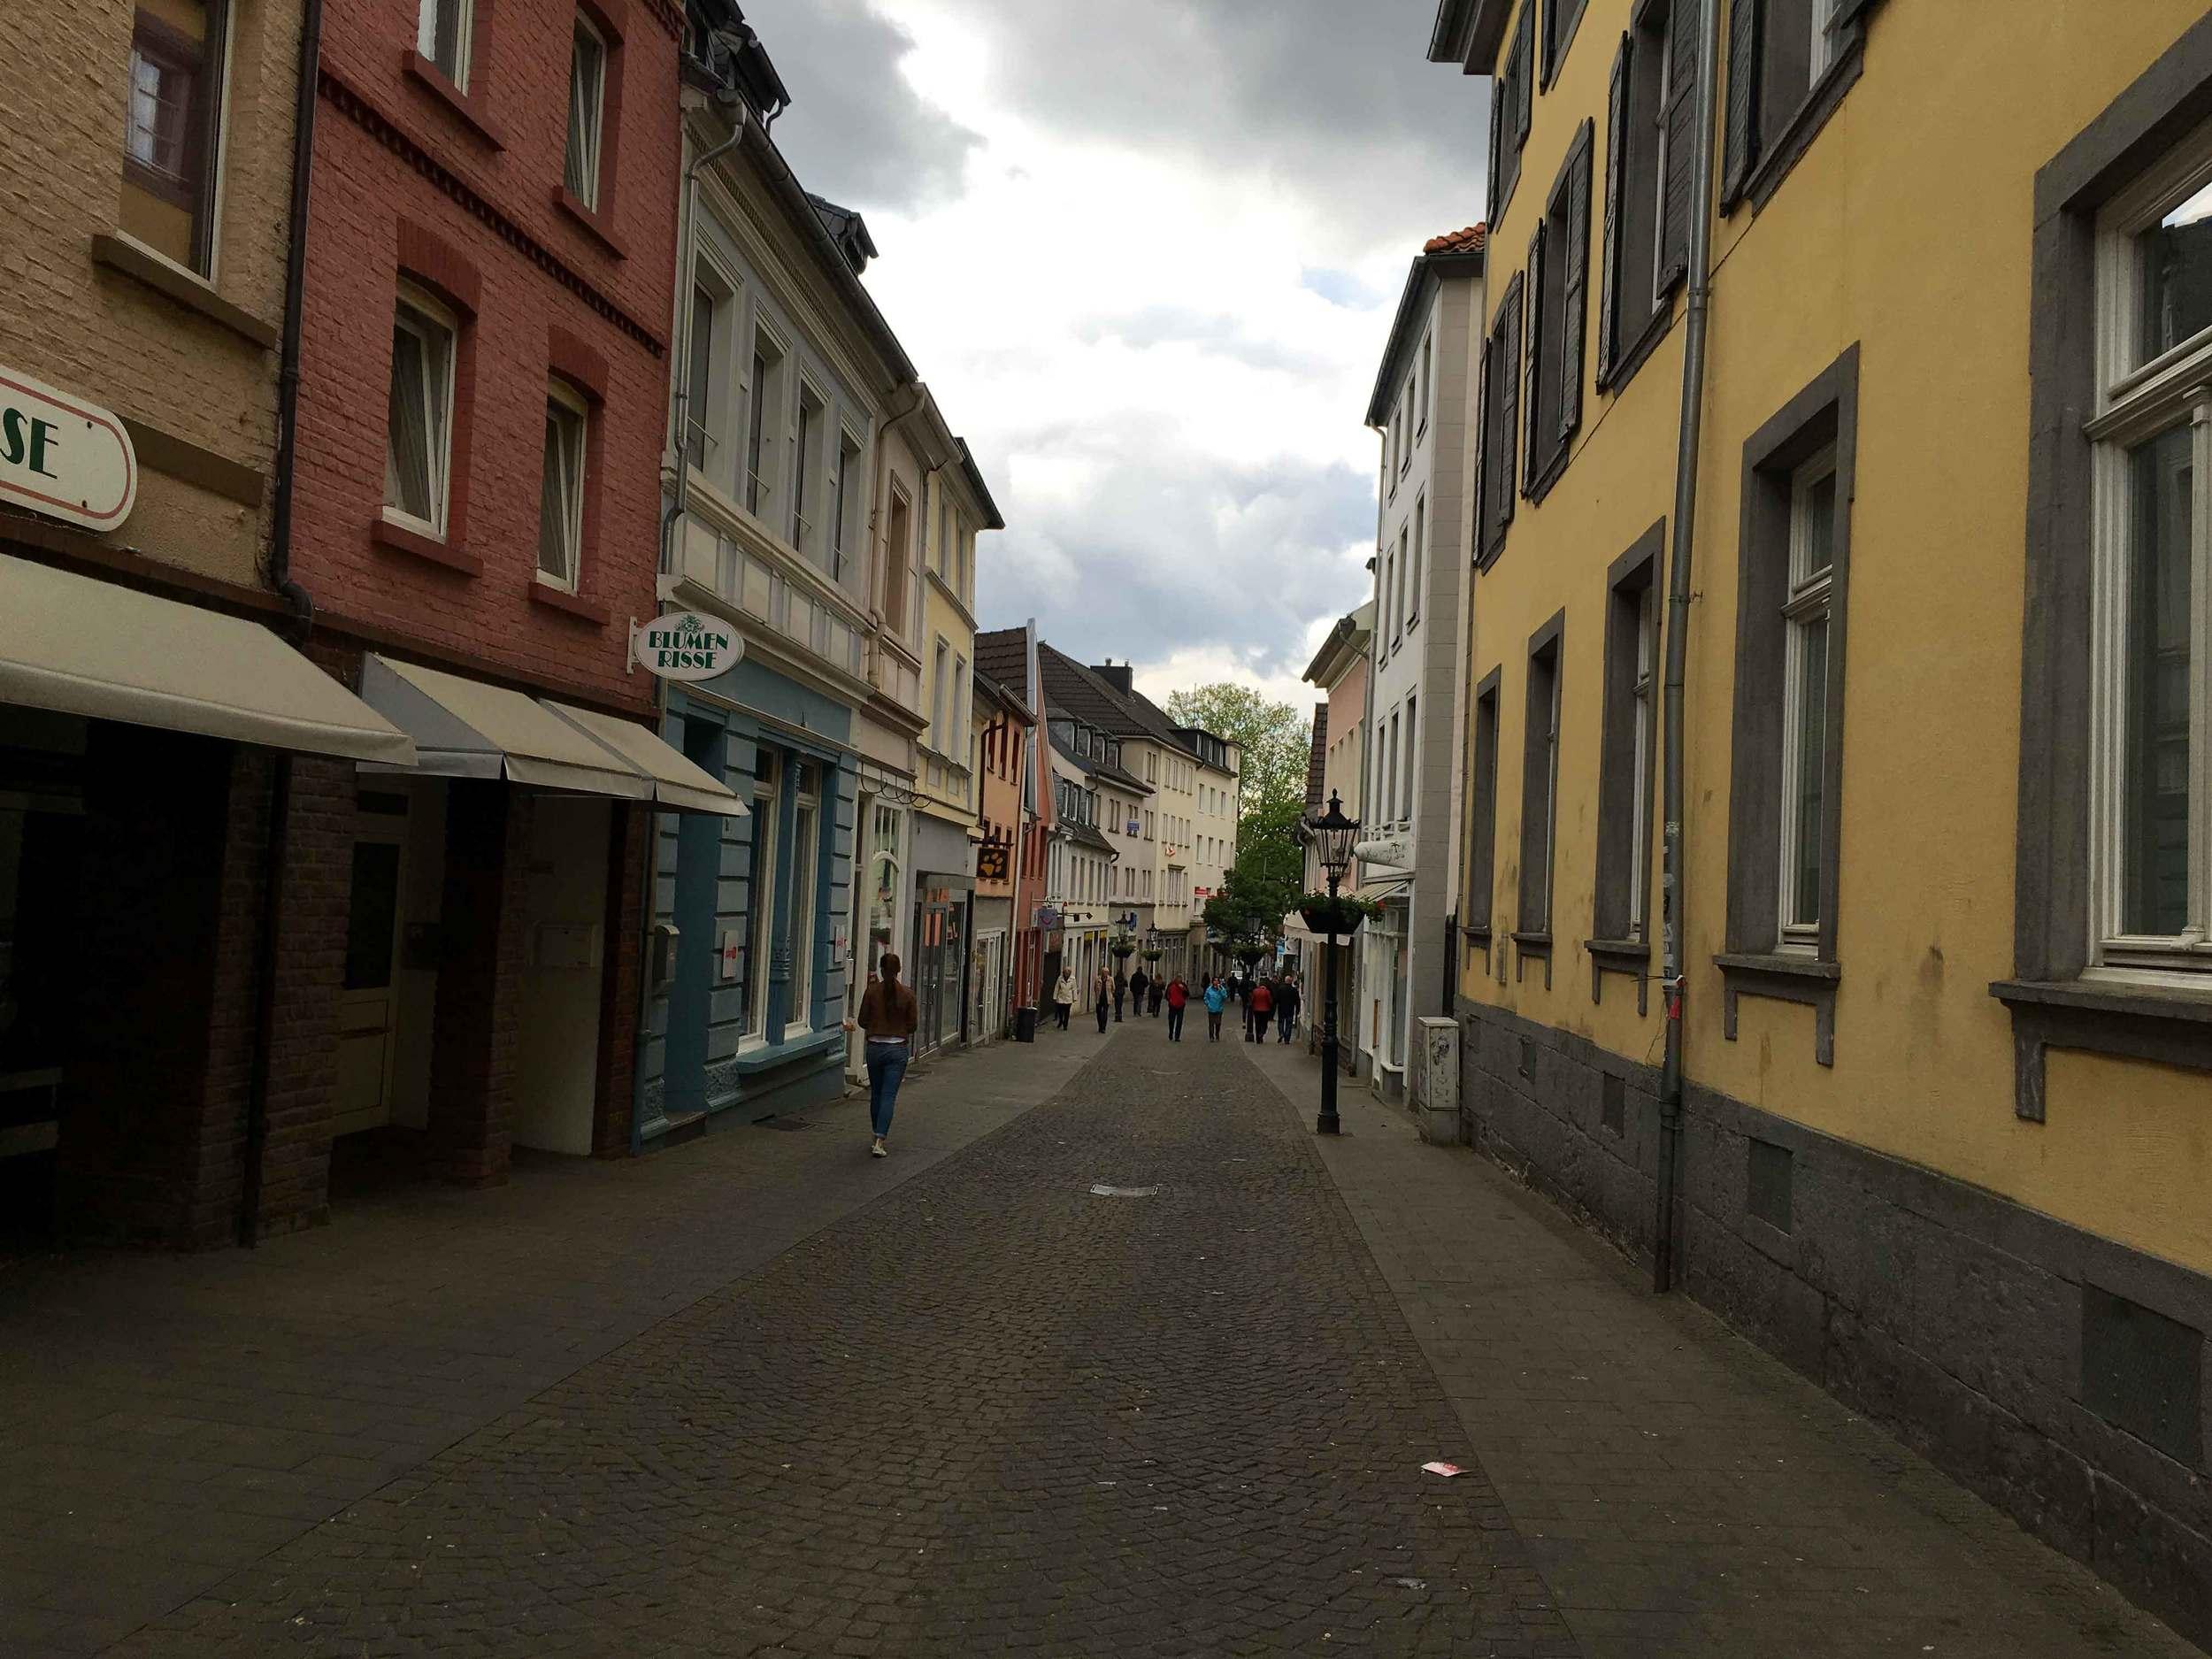 Streets of Ratingen, Germany. Image©sourcingstyle.com, Photo: Nicola Nolting